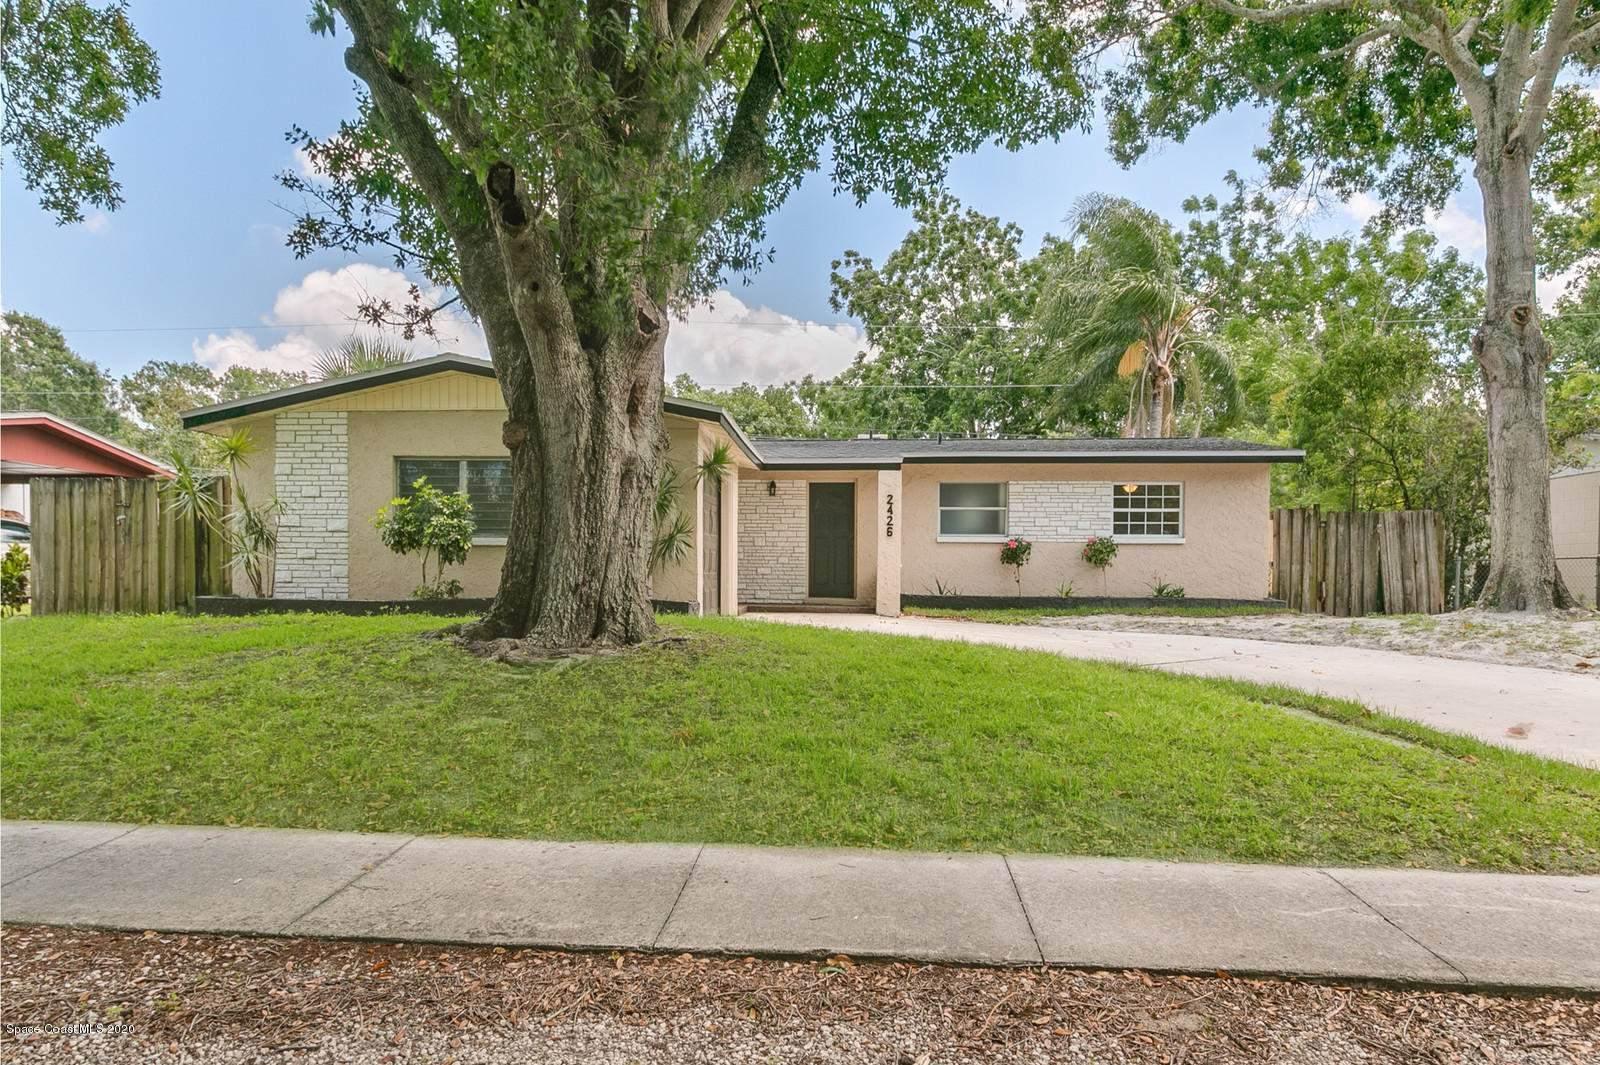 2426 Auburn Drive, Cocoa, FL 32926